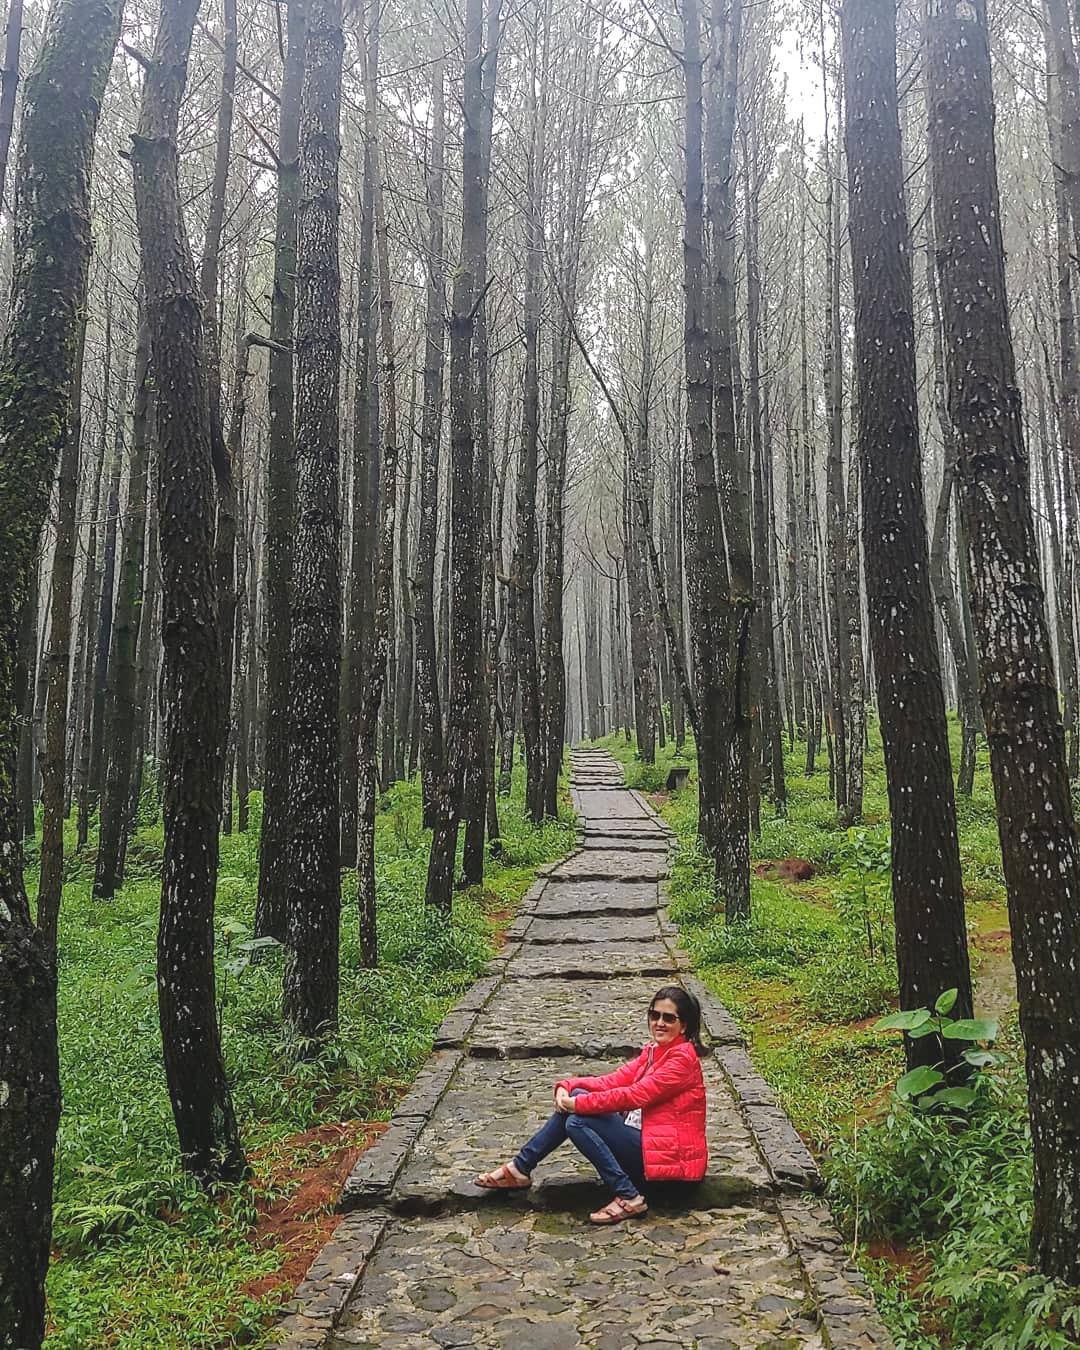 Hutan Pinus Eropa : hutan, pinus, eropa, Tempat, Wisata, Semarang, Bernuansa, Keren